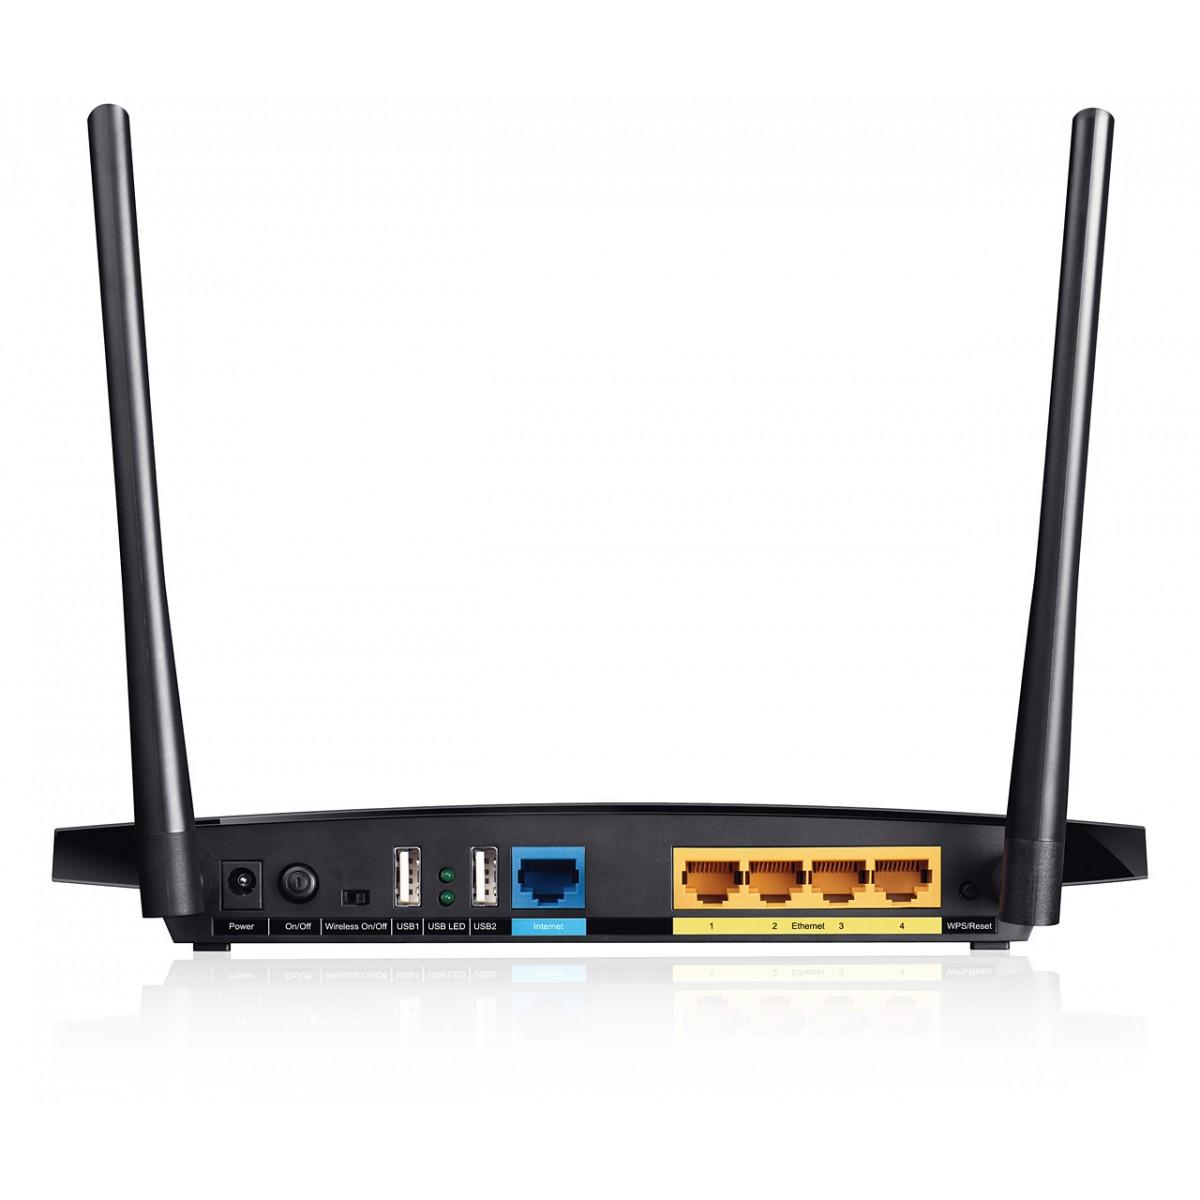 Roteador Wireless Gigabit Dual-Band TL-WDR3600 ( 300+300Mbps) C/2 Antenas ( 1Wan/4Lan/2USB) - Tplink